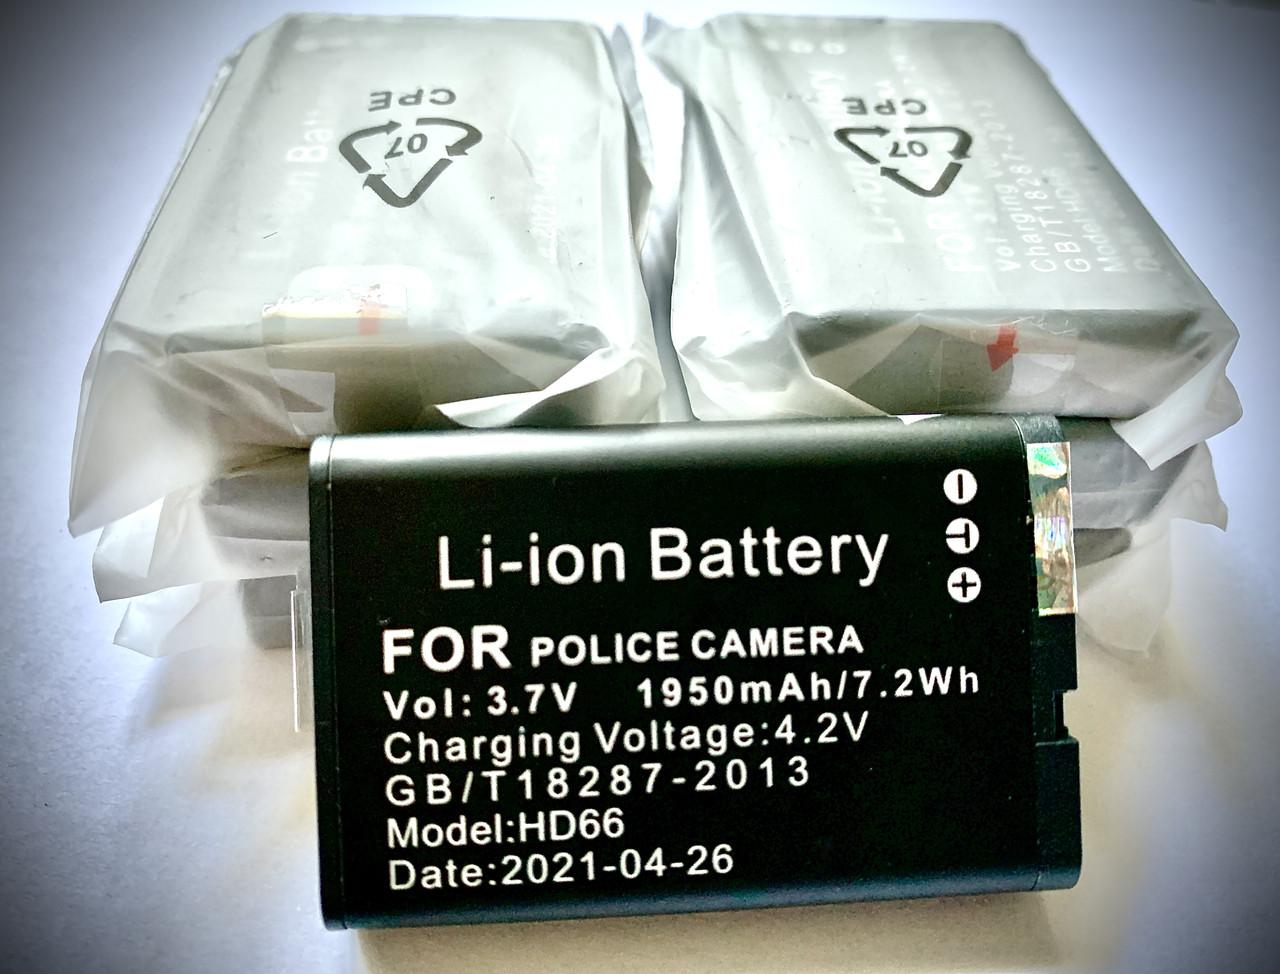 Акумуляторні батареї для нагрудної поліцейської камери